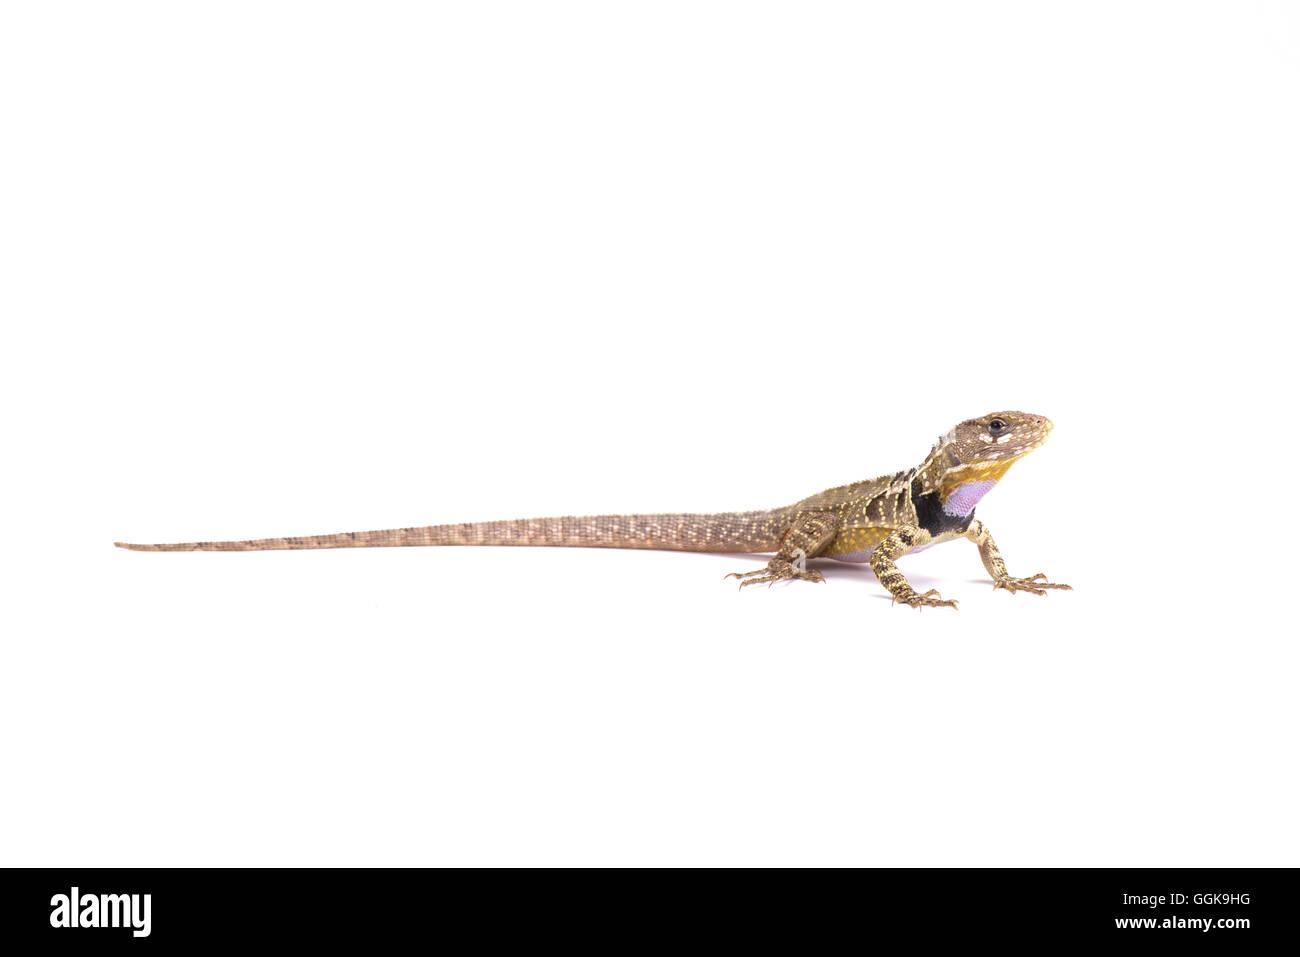 Peruvian purple throated lizard  (Stenocercus imitator) - Stock Image